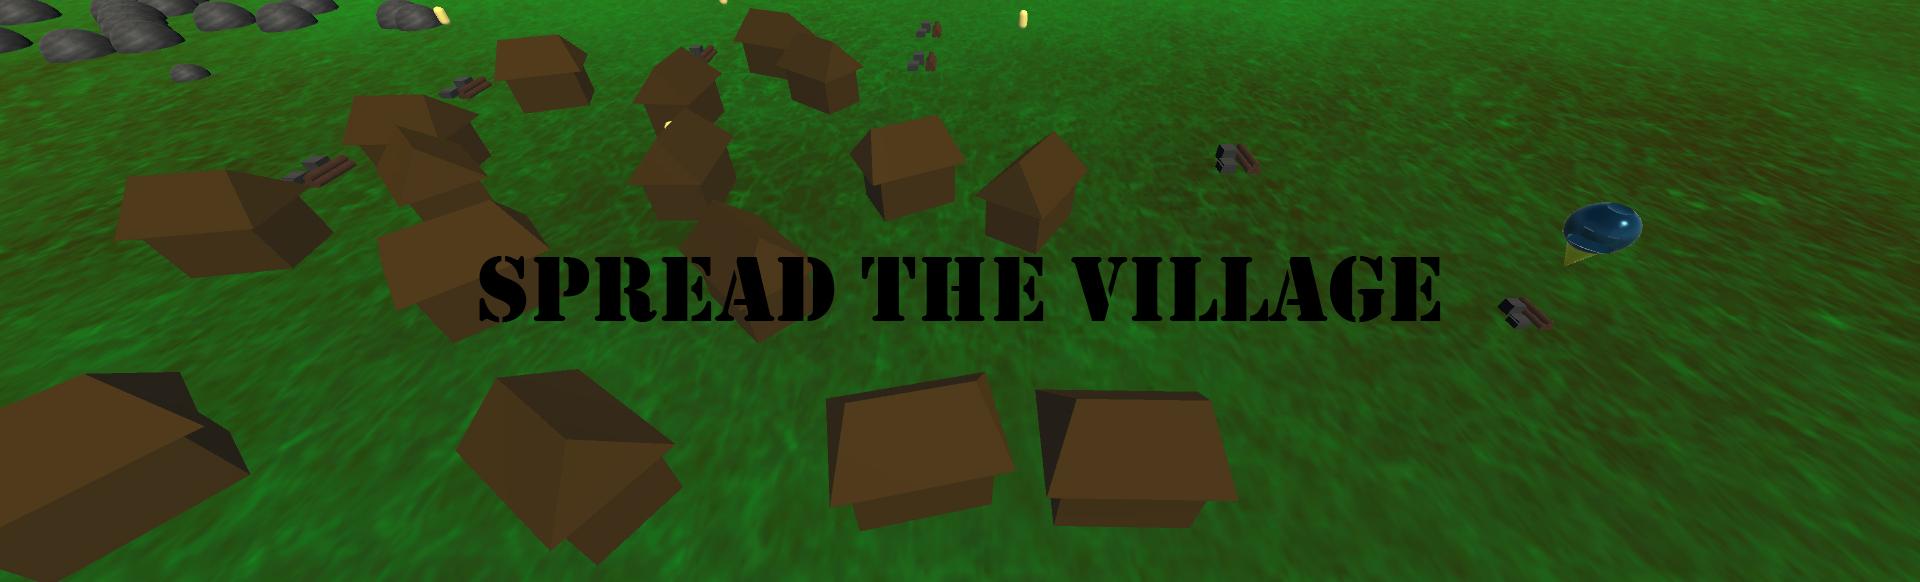 Spread The Village